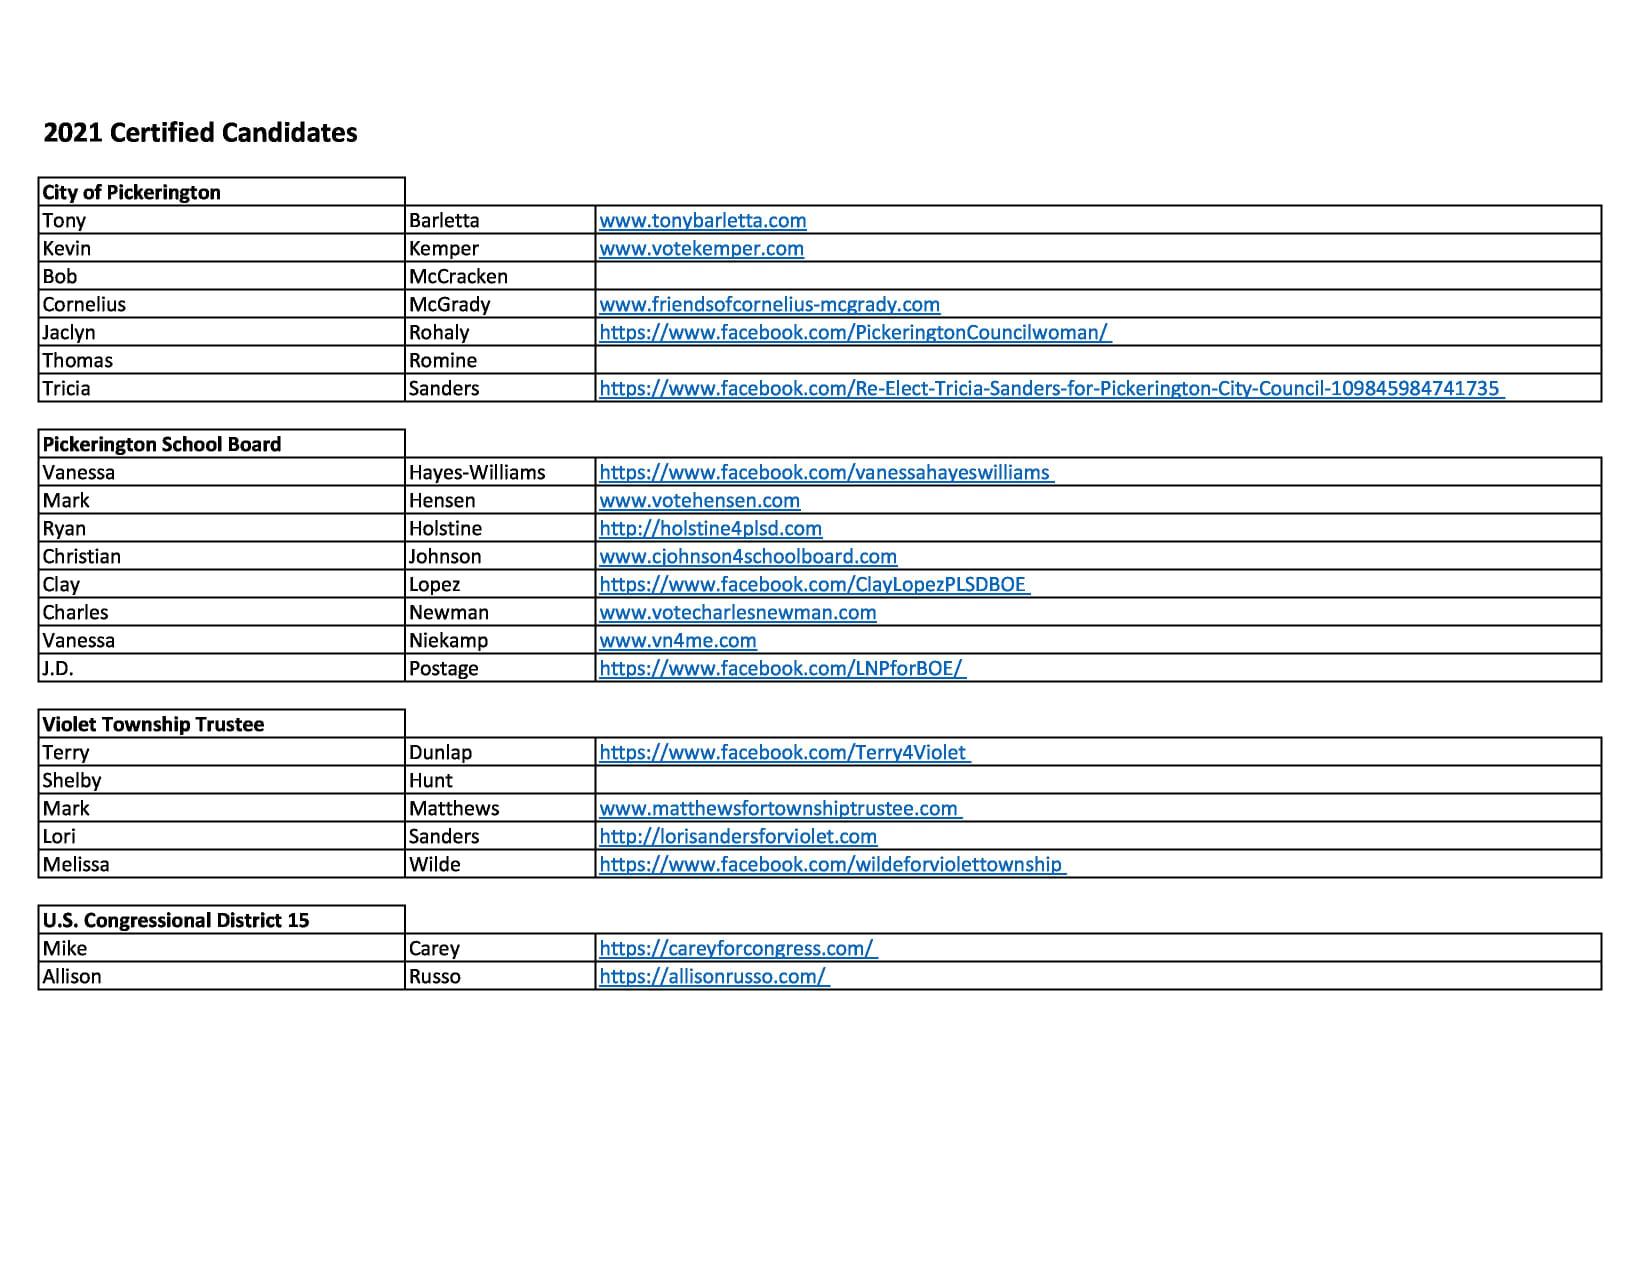 Certified-Candidates---Nov.-2021-page-0-w1650.jpg